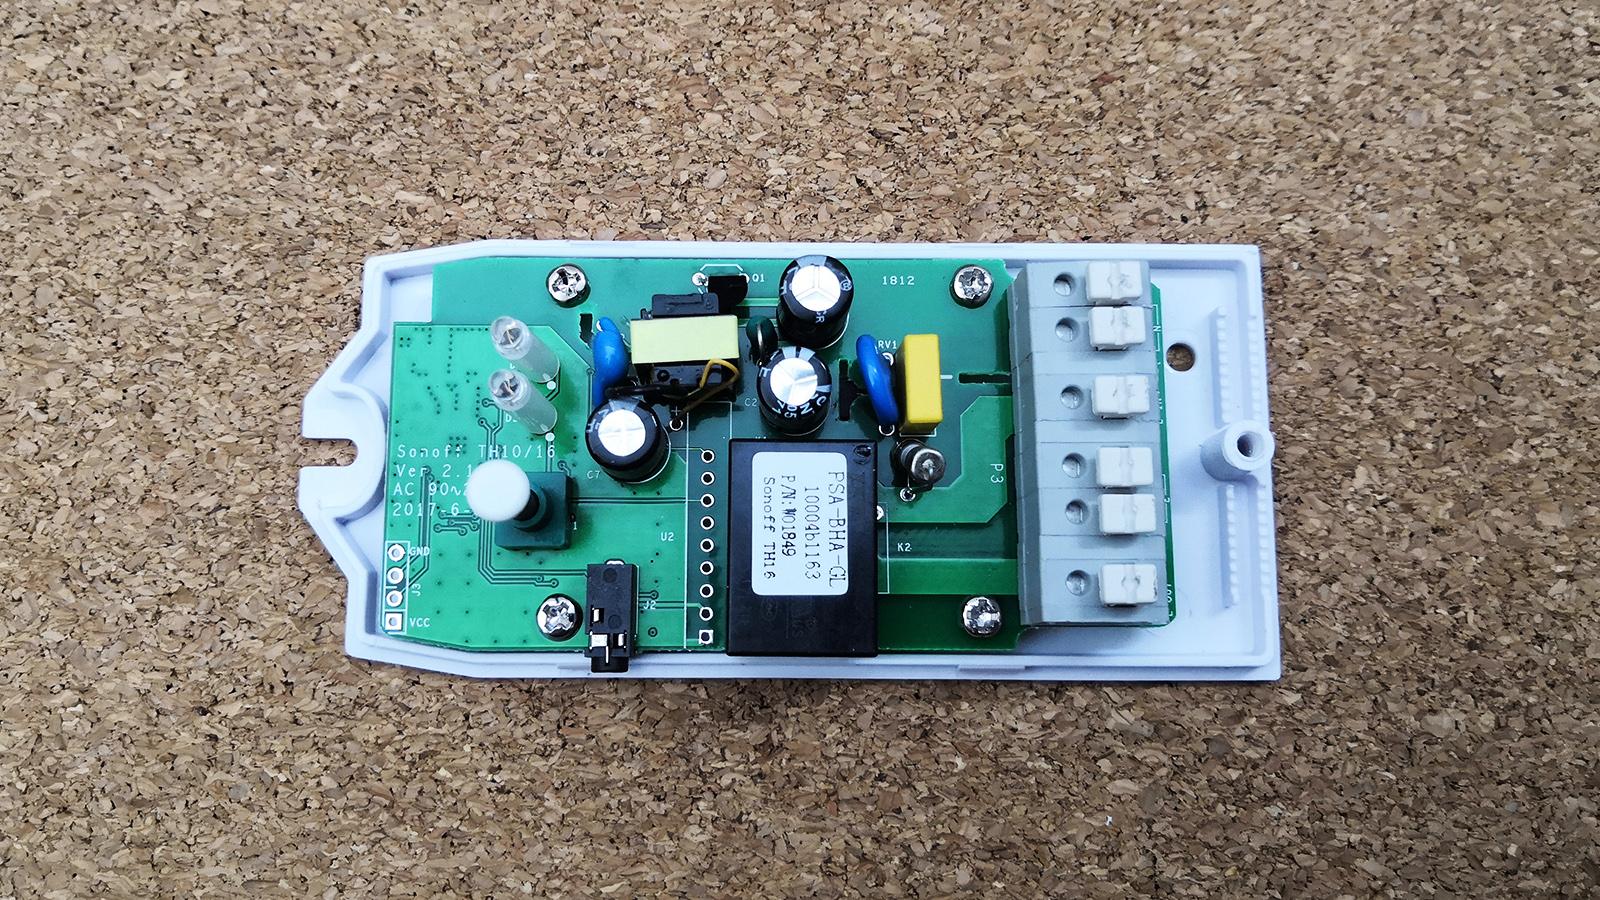 Chytrá domácnost - Sonoff termostat PCB